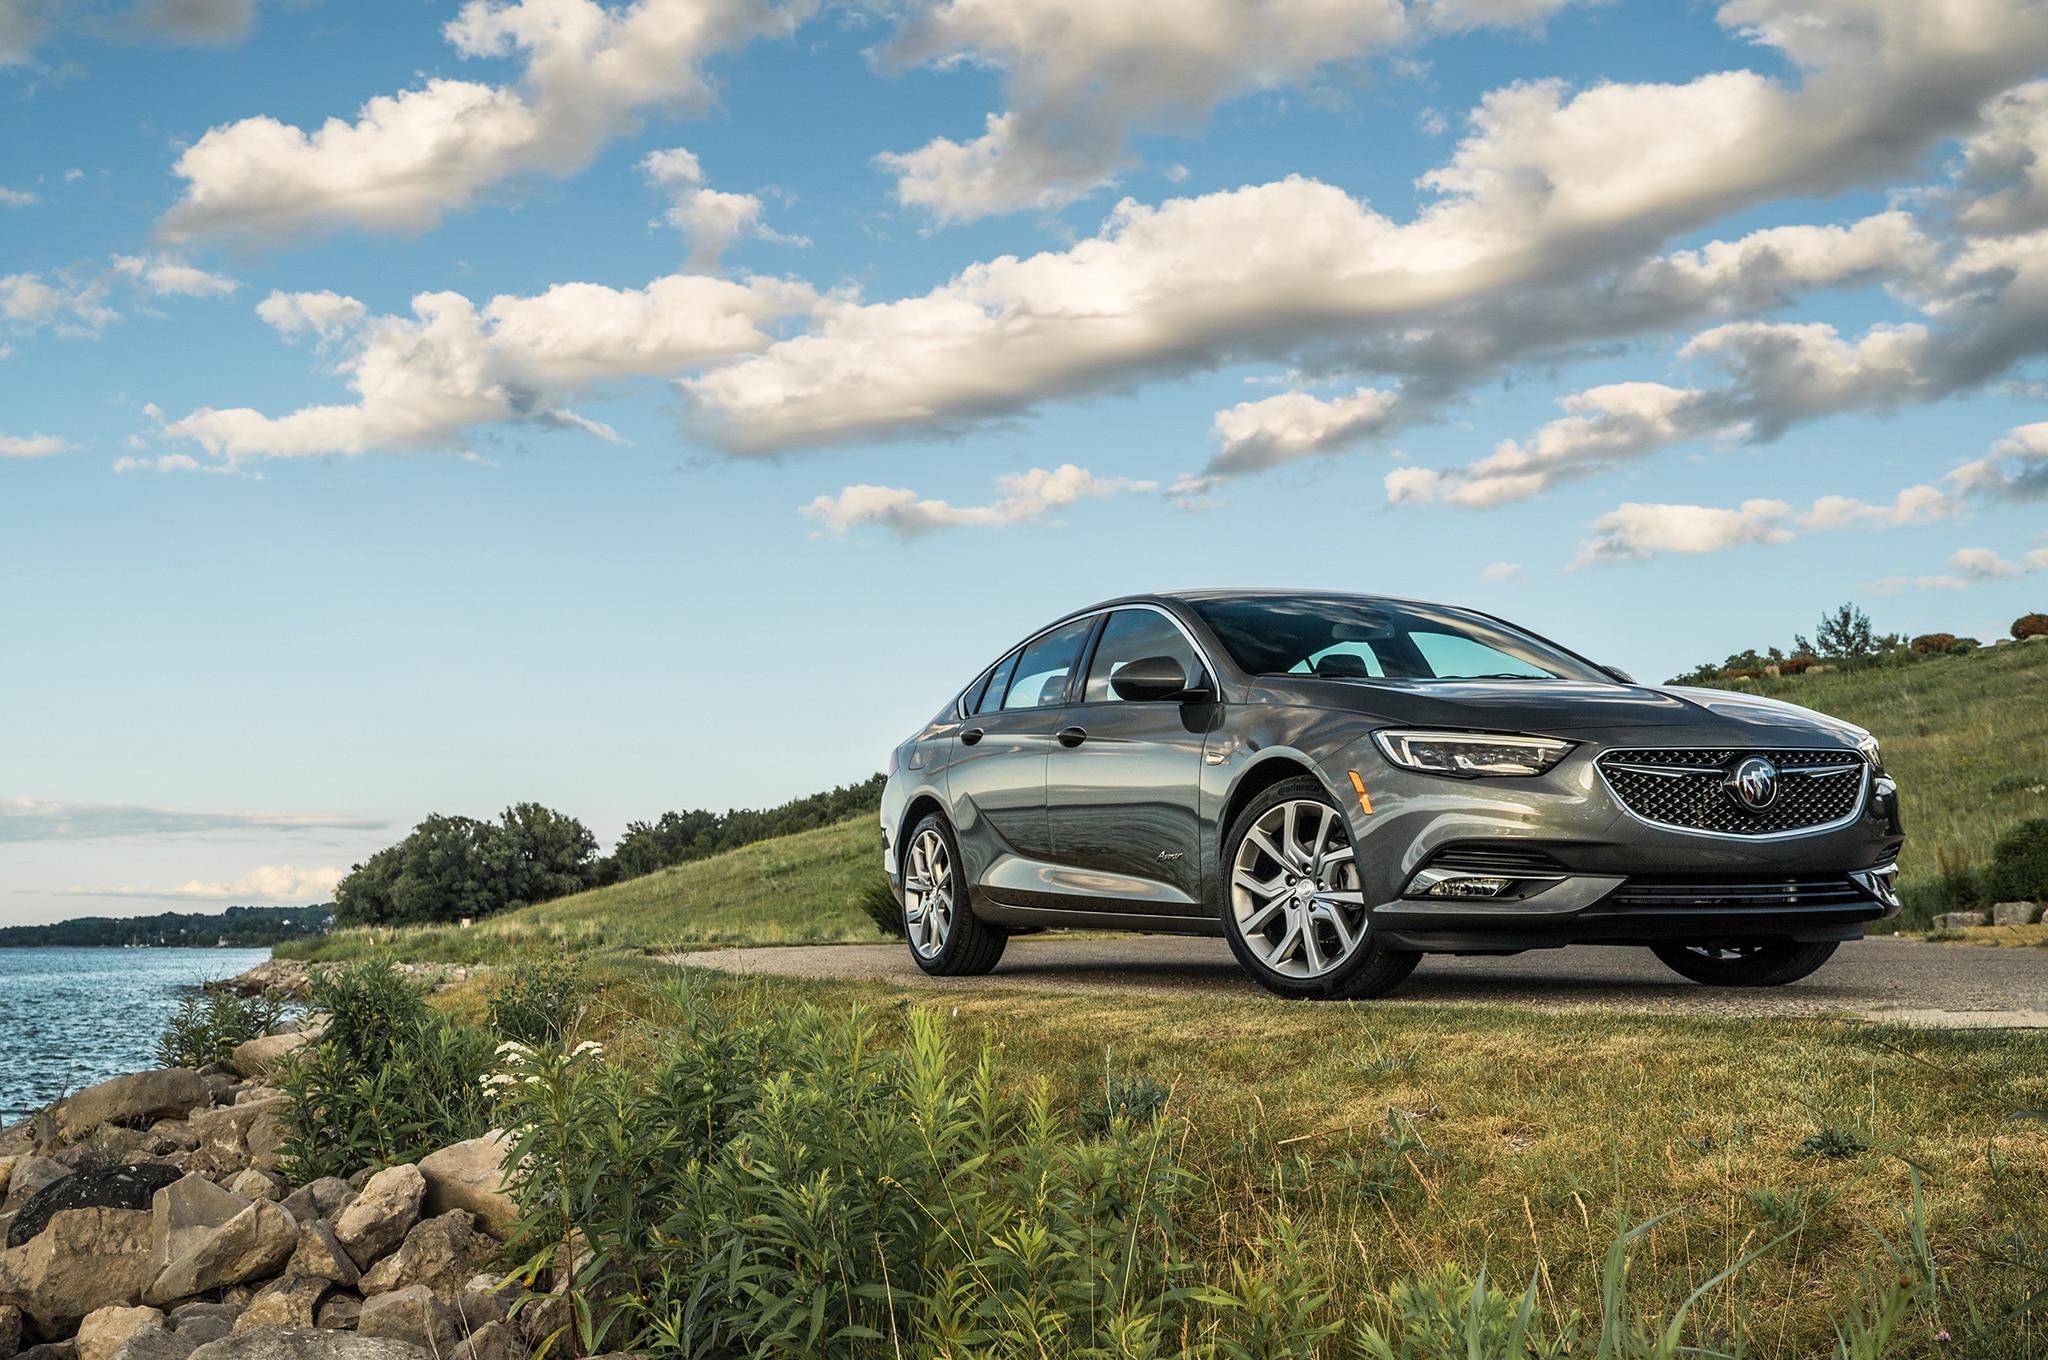 2019 Buick Regal Sportback Gets Fancy Avenir Trim Level ...